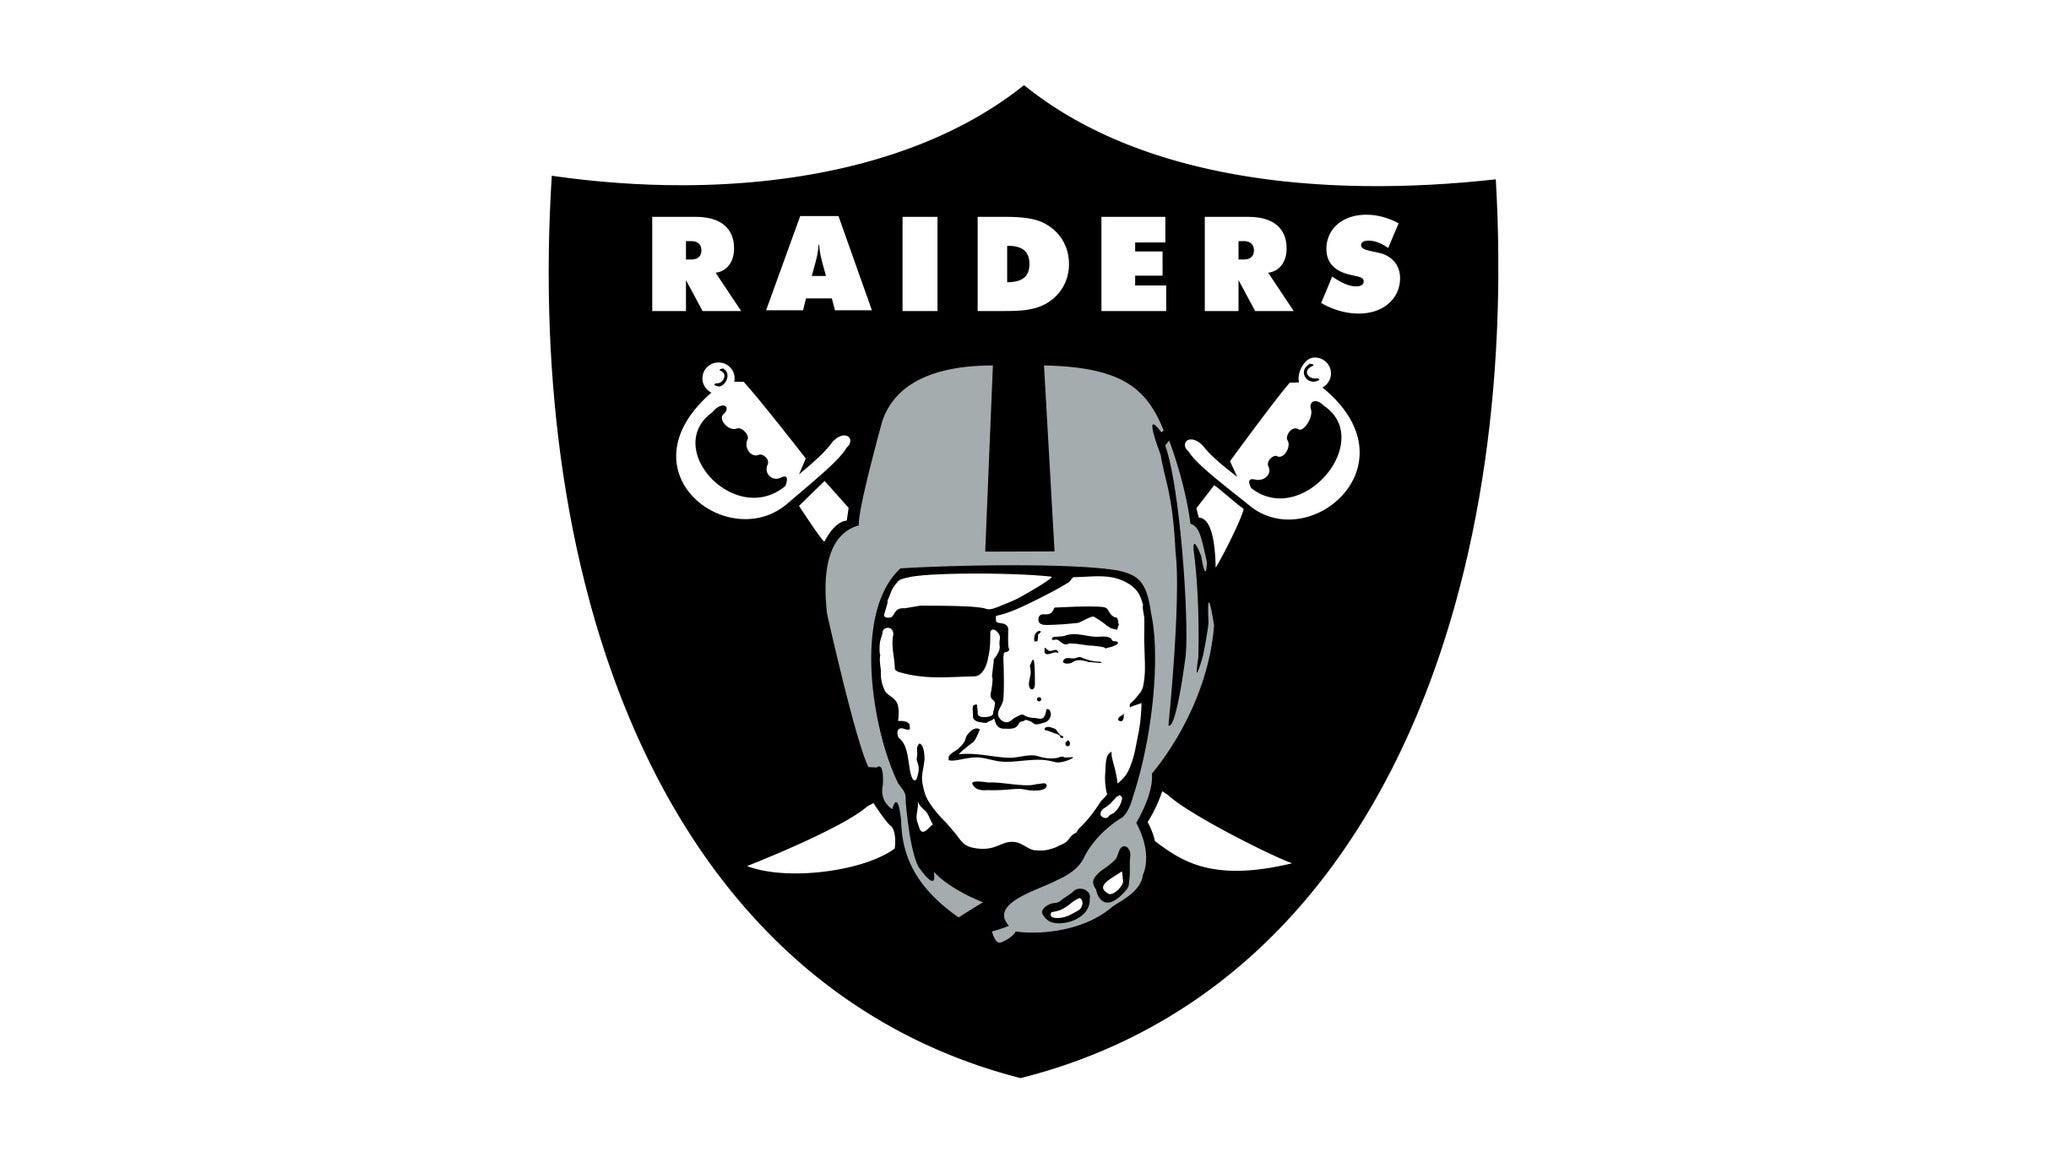 Oakland Raiders vs. Buffalo Bills - Oakland, CA 94621